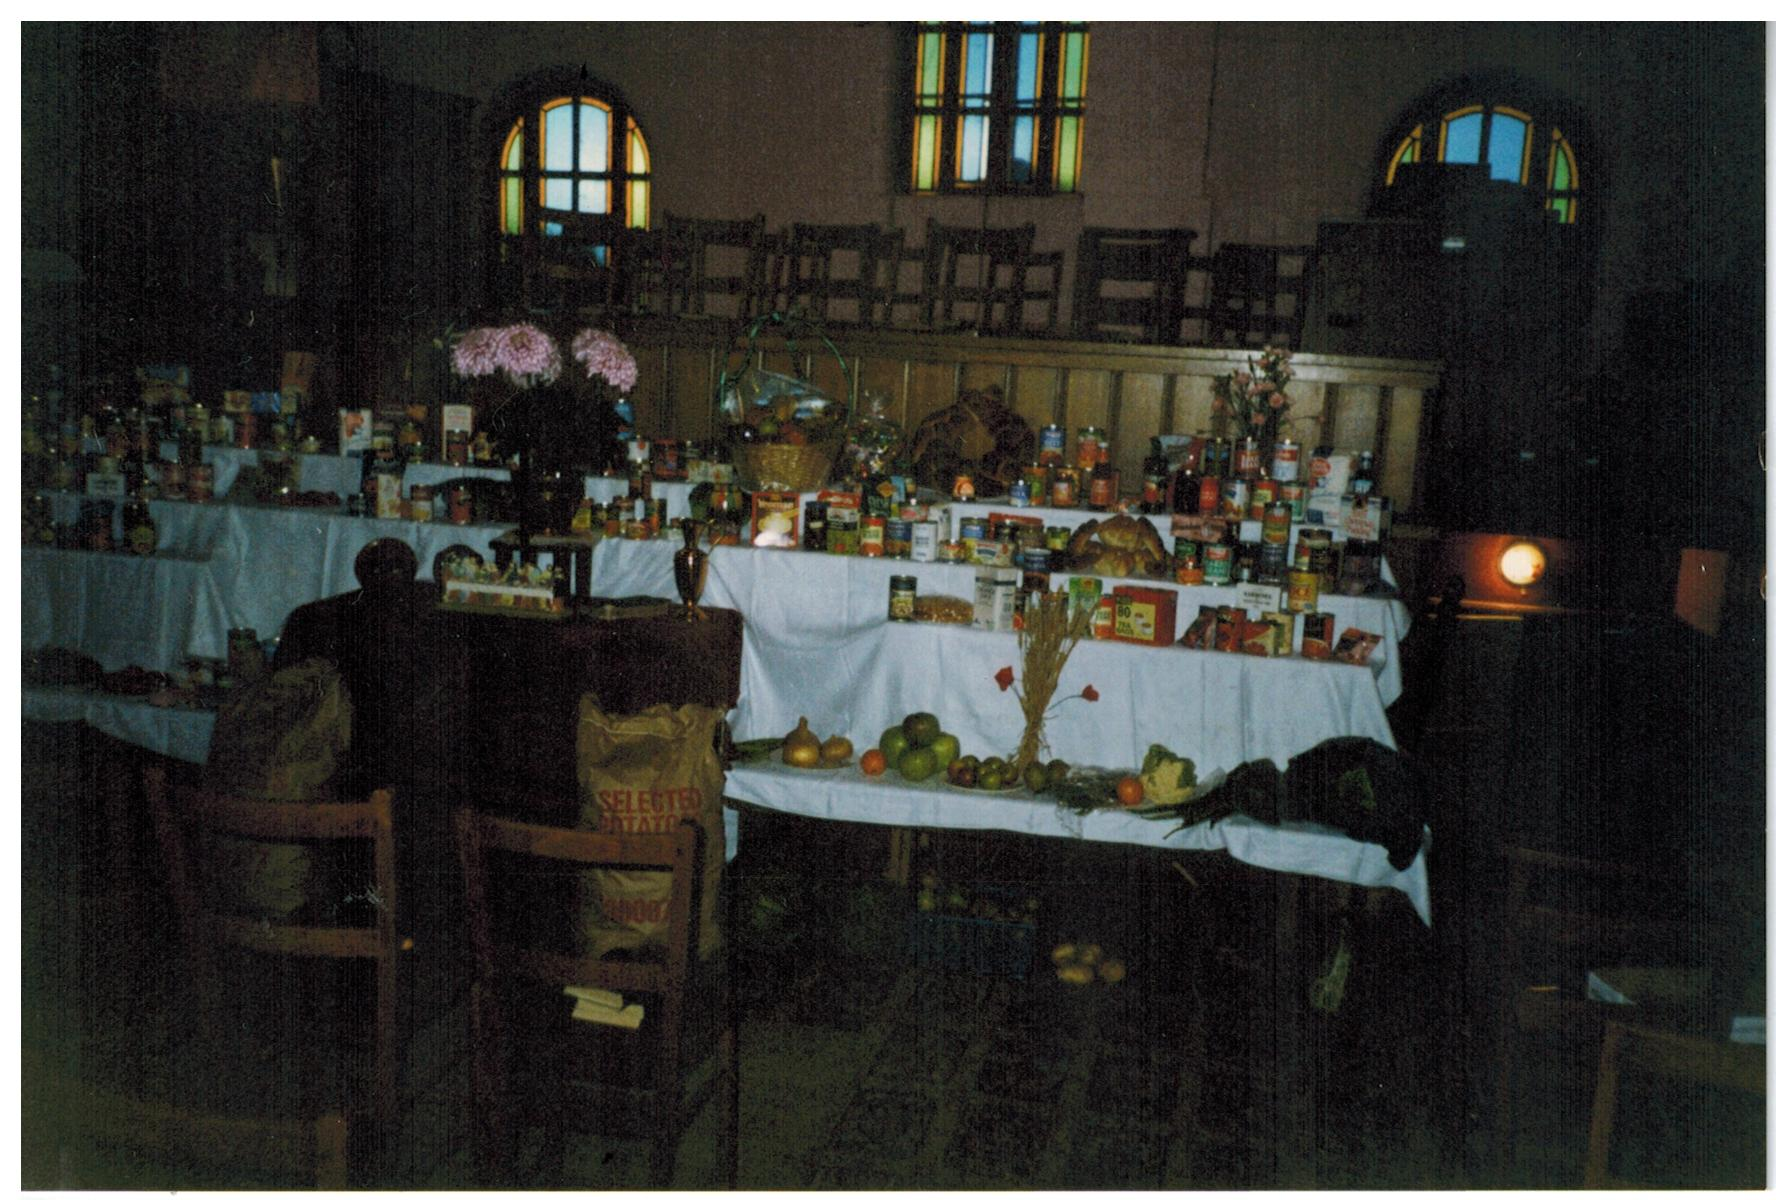 B166 Harvest 1997